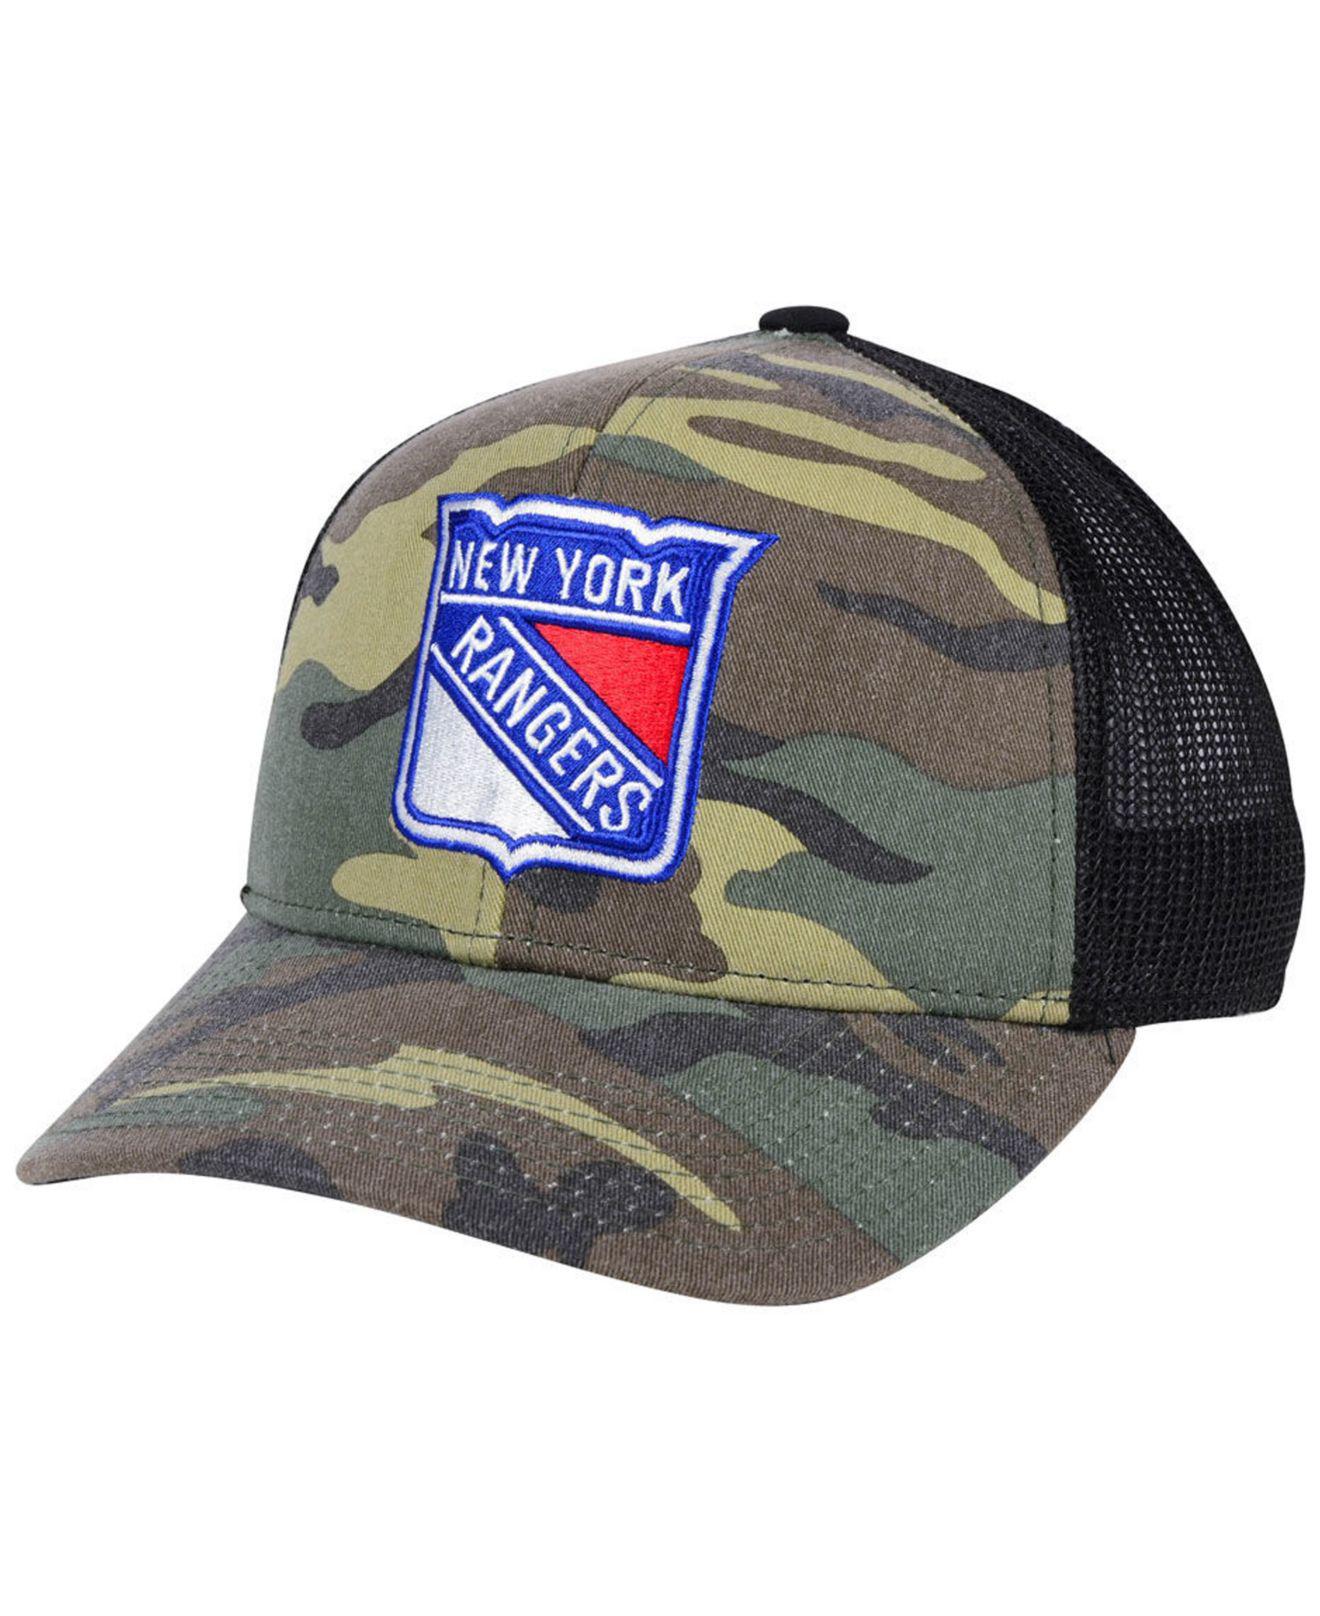 Lyst - adidas New York Rangers Camo Trucker Cap for Men 284116501